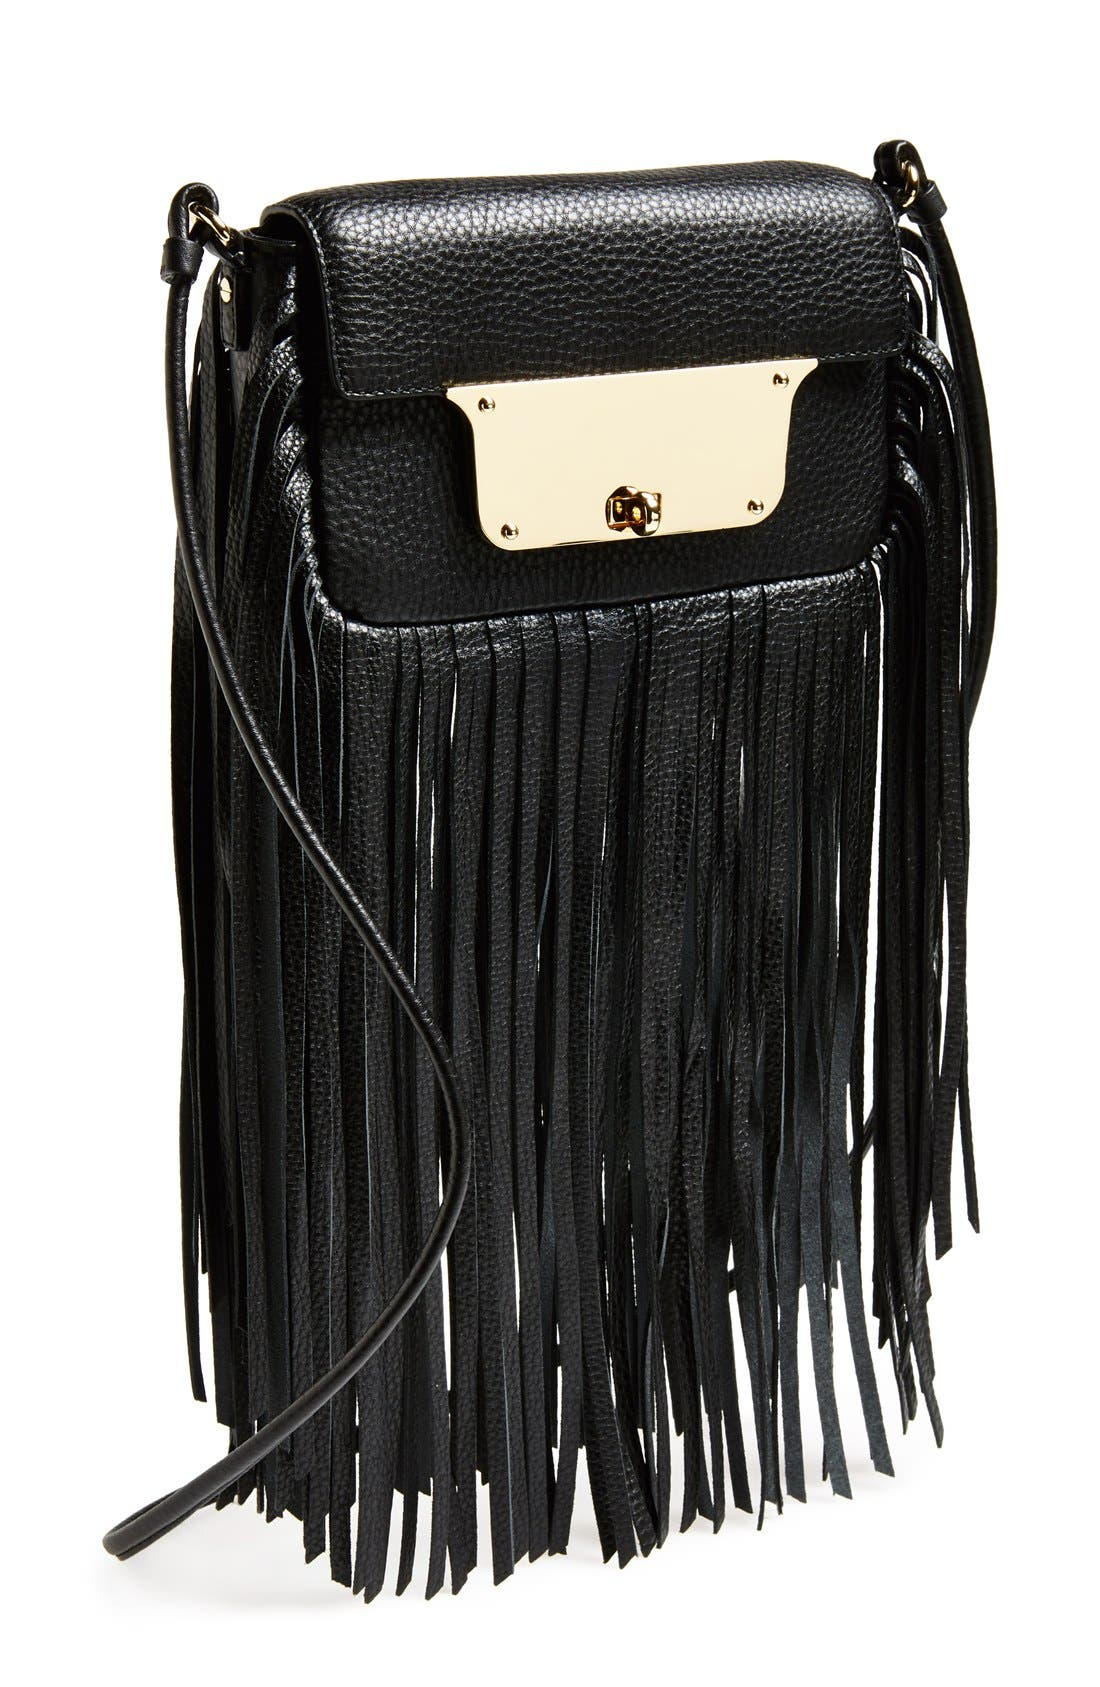 MILLY 'Isabella' Fringe Crossbody Bag, Main, color, 001